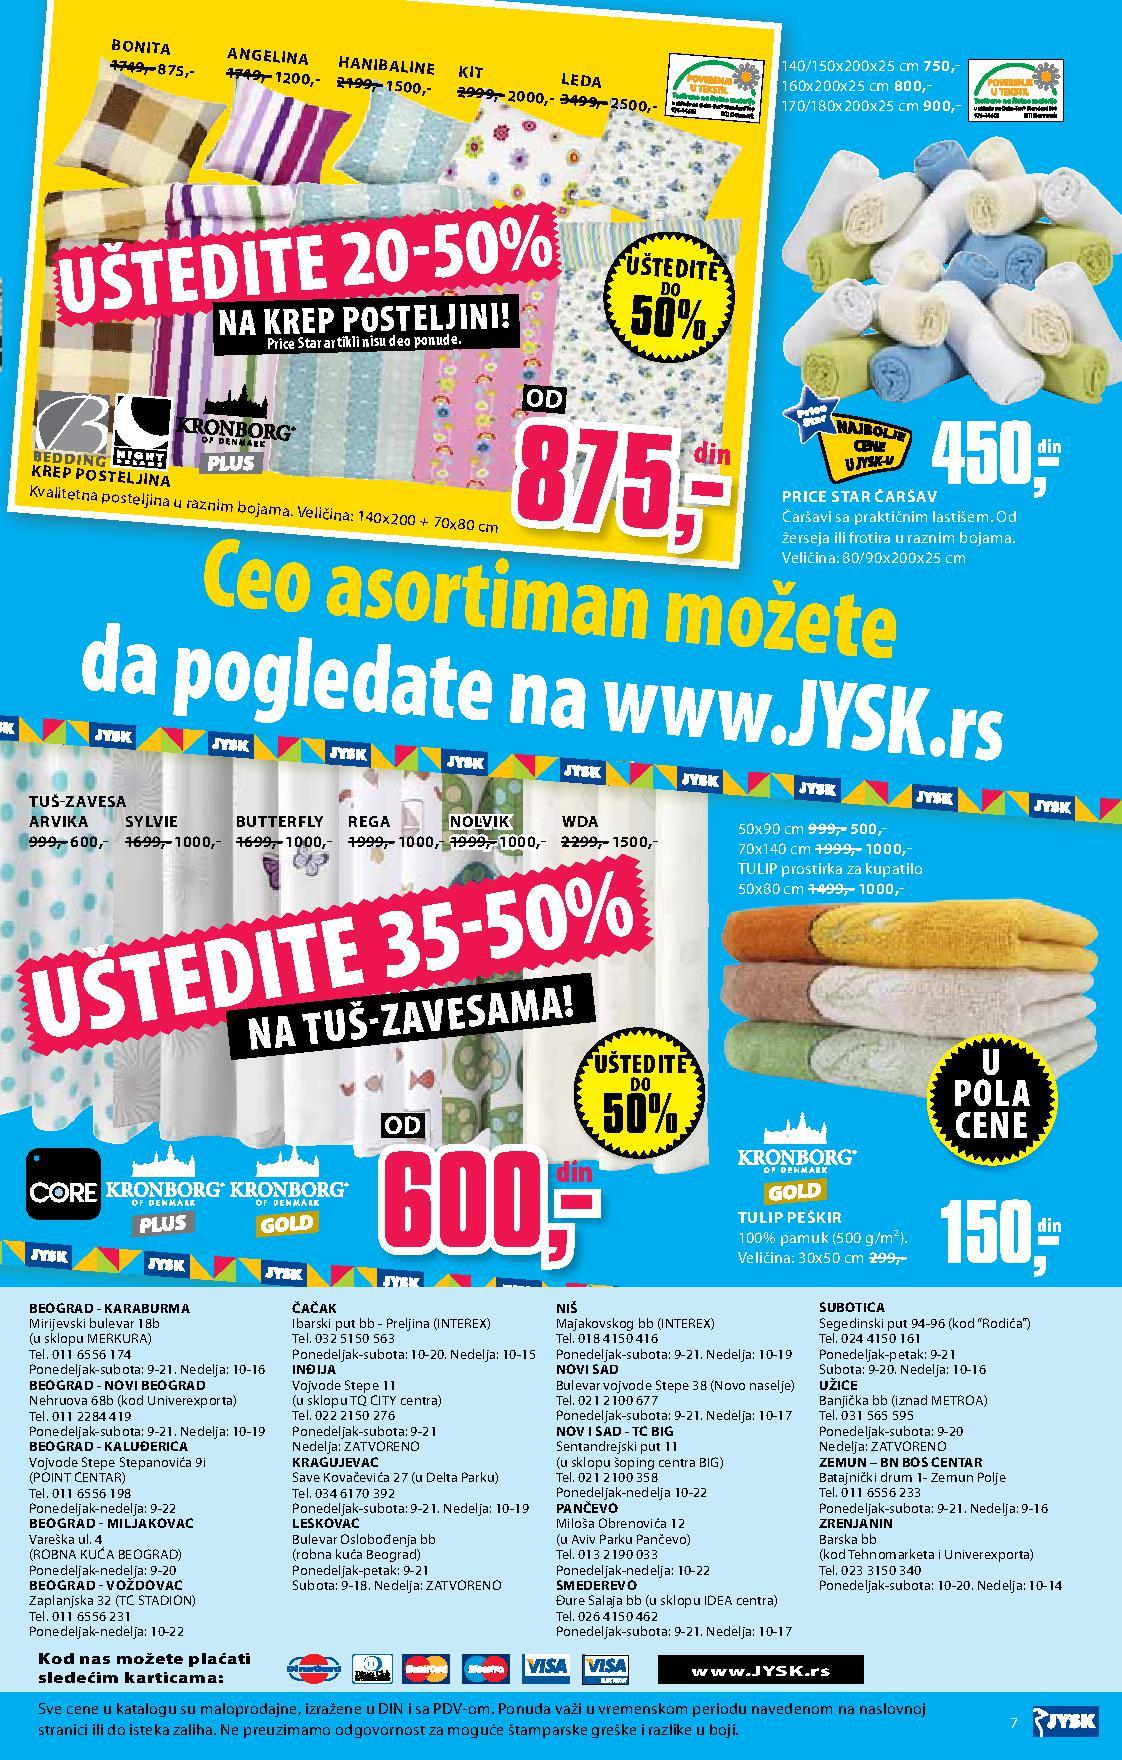 JYSK katalog super cena